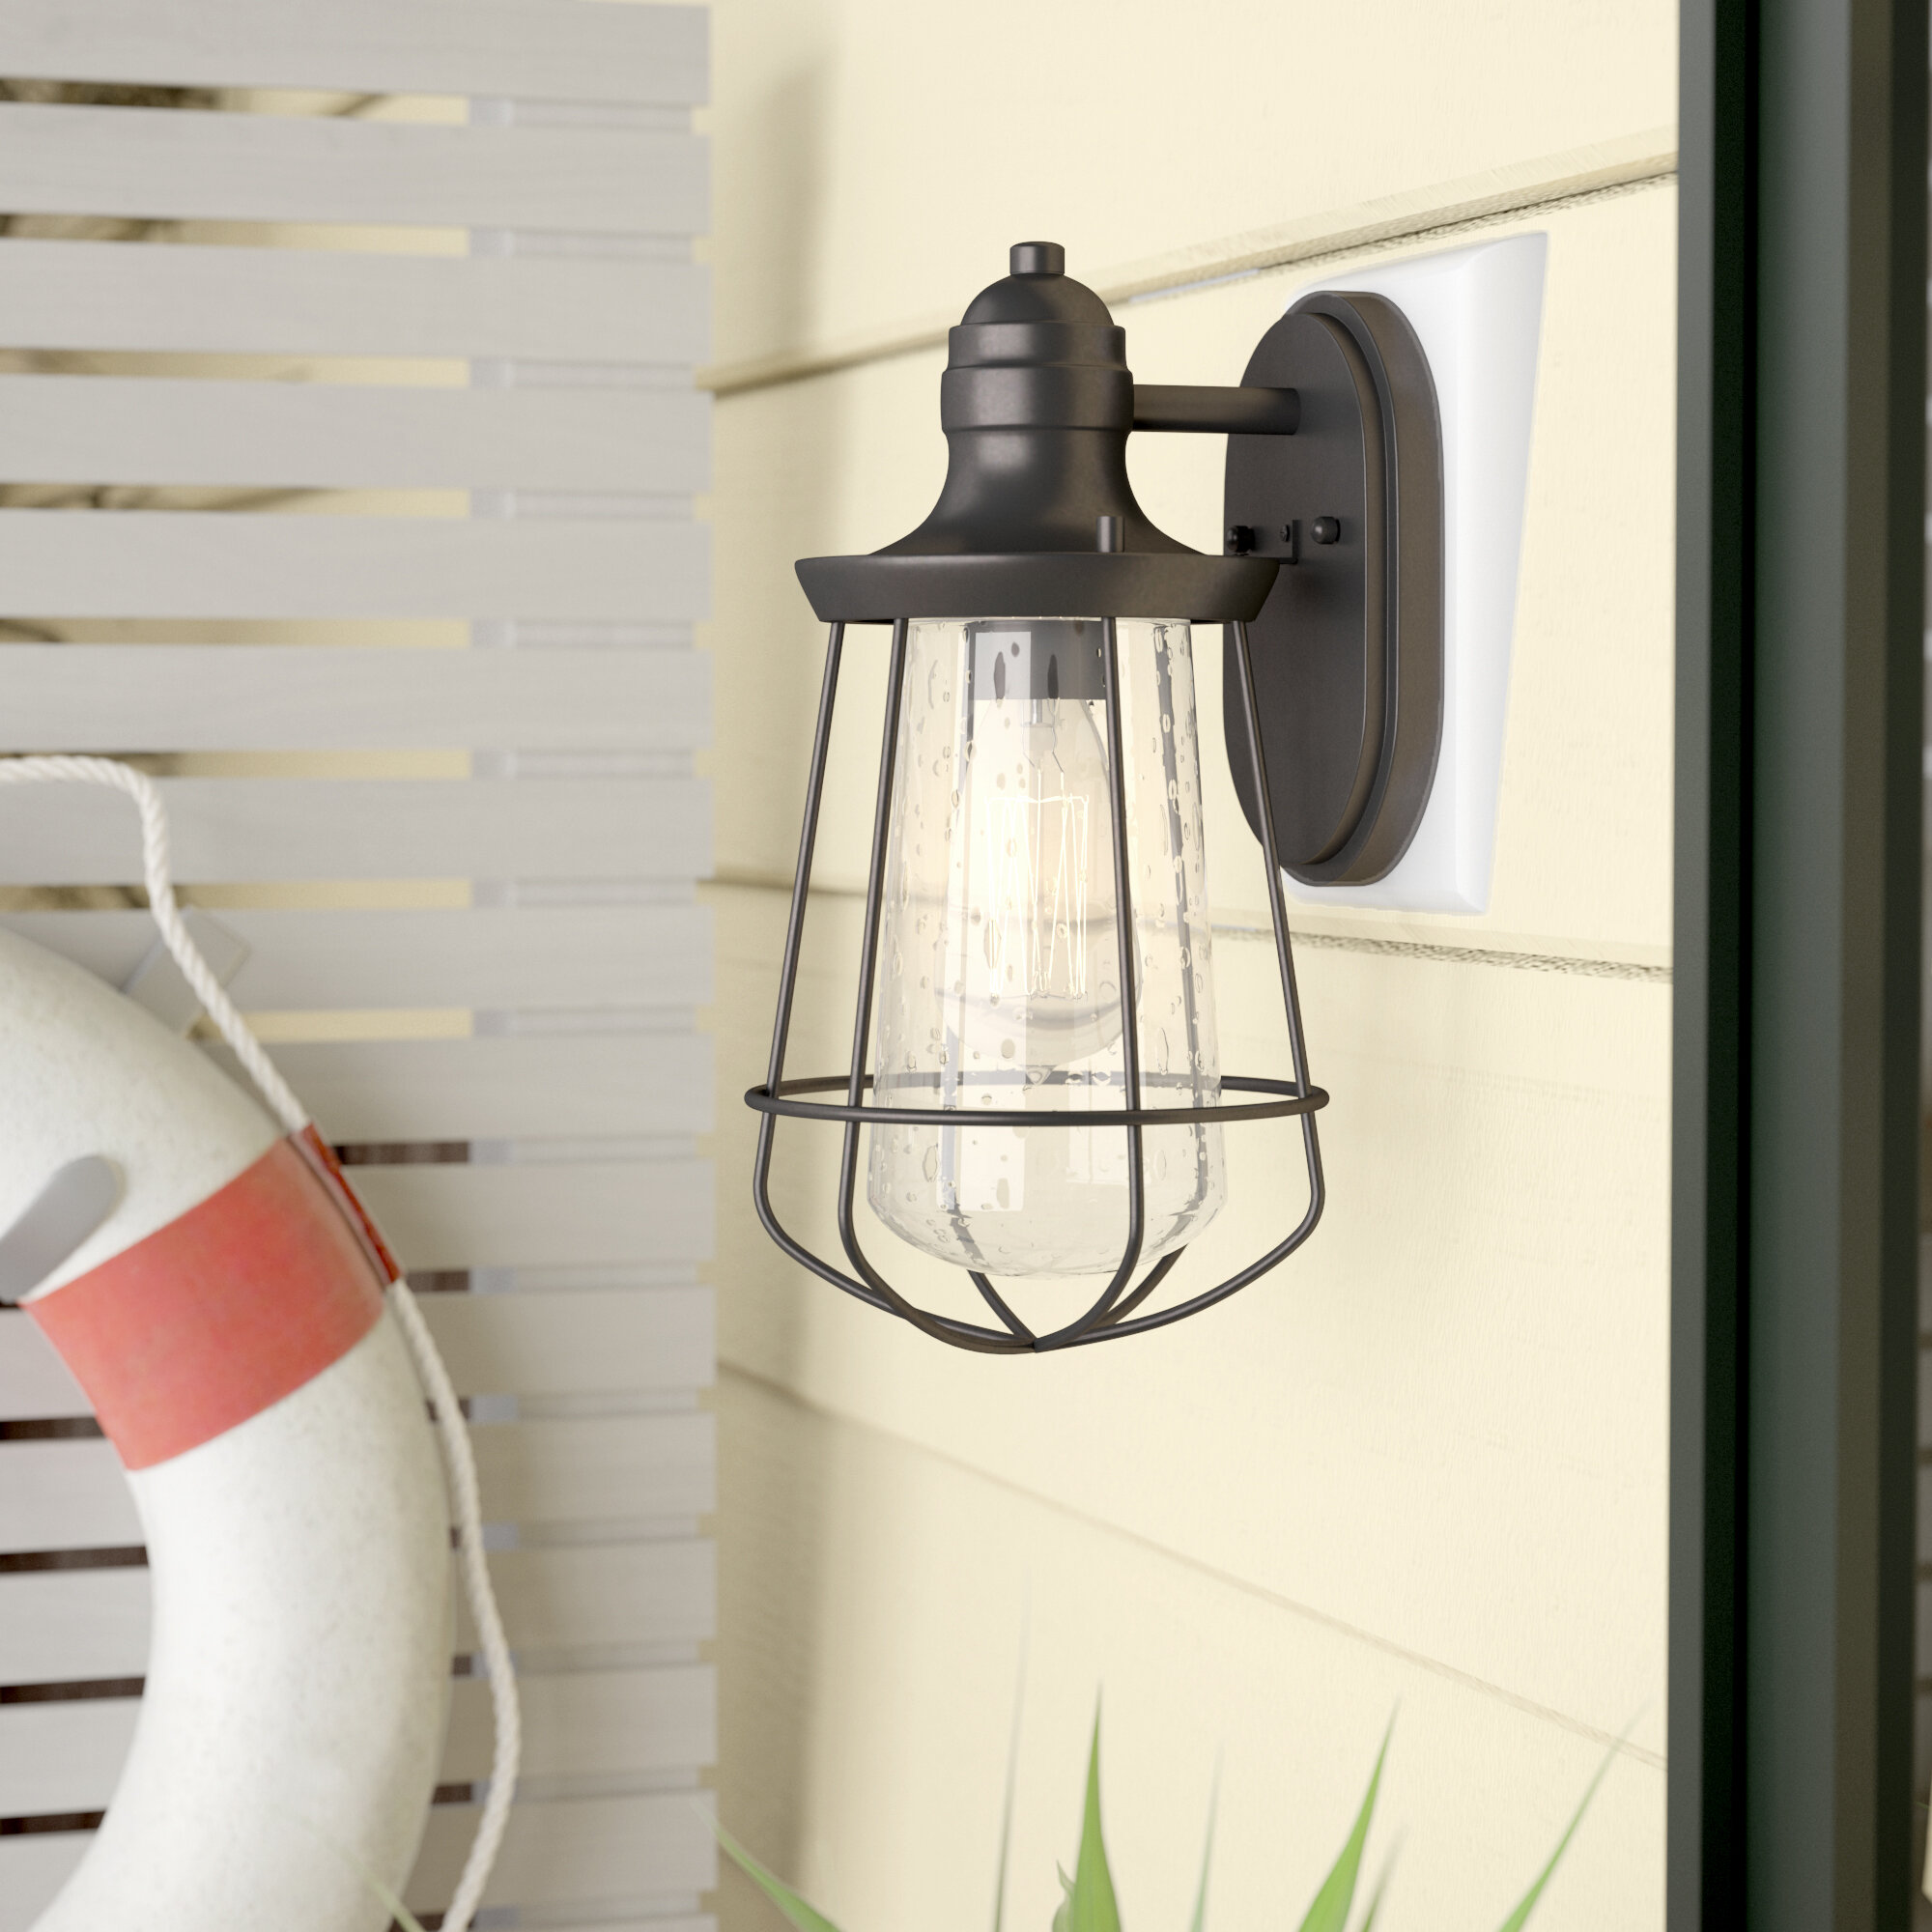 Breakwater bay windon 1 light outdoor wall lantern reviews wayfair